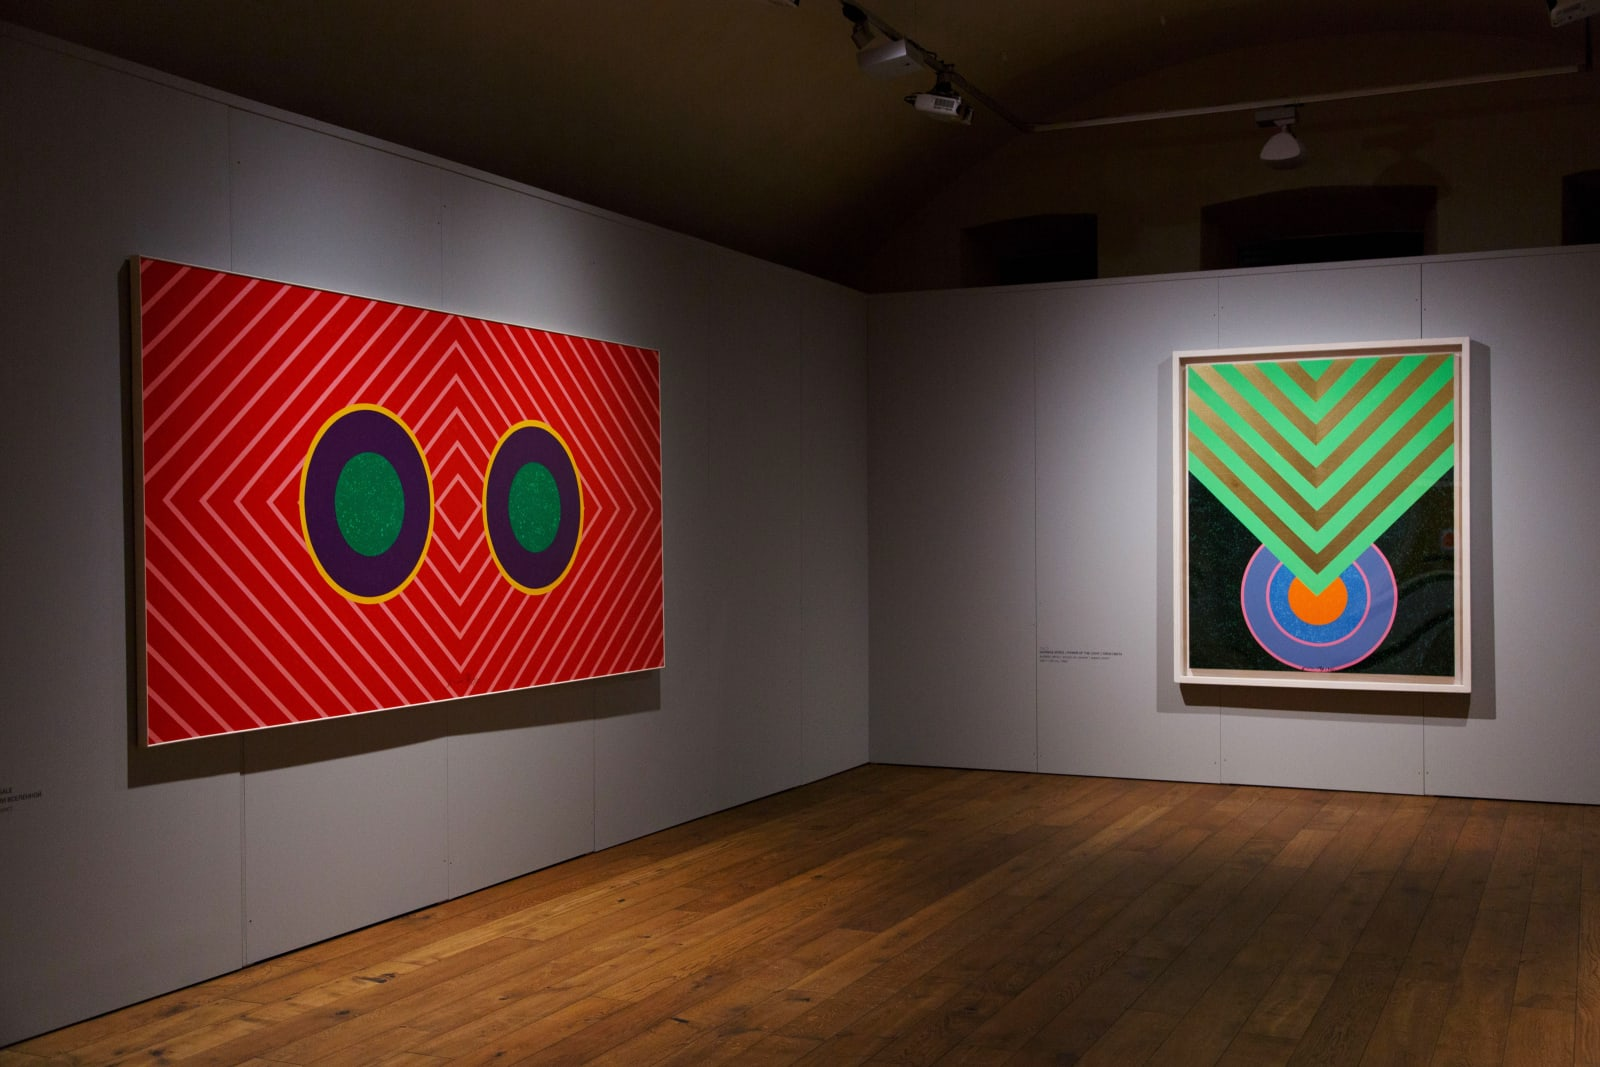 In my beginning is my end: the art of Hsiao Chin 在我的開始是我的結束:蕭勤的藝術, Mark Rothko Art Centre 馬克·羅斯科藝術中心, Latvia拉脫維亞, 2020